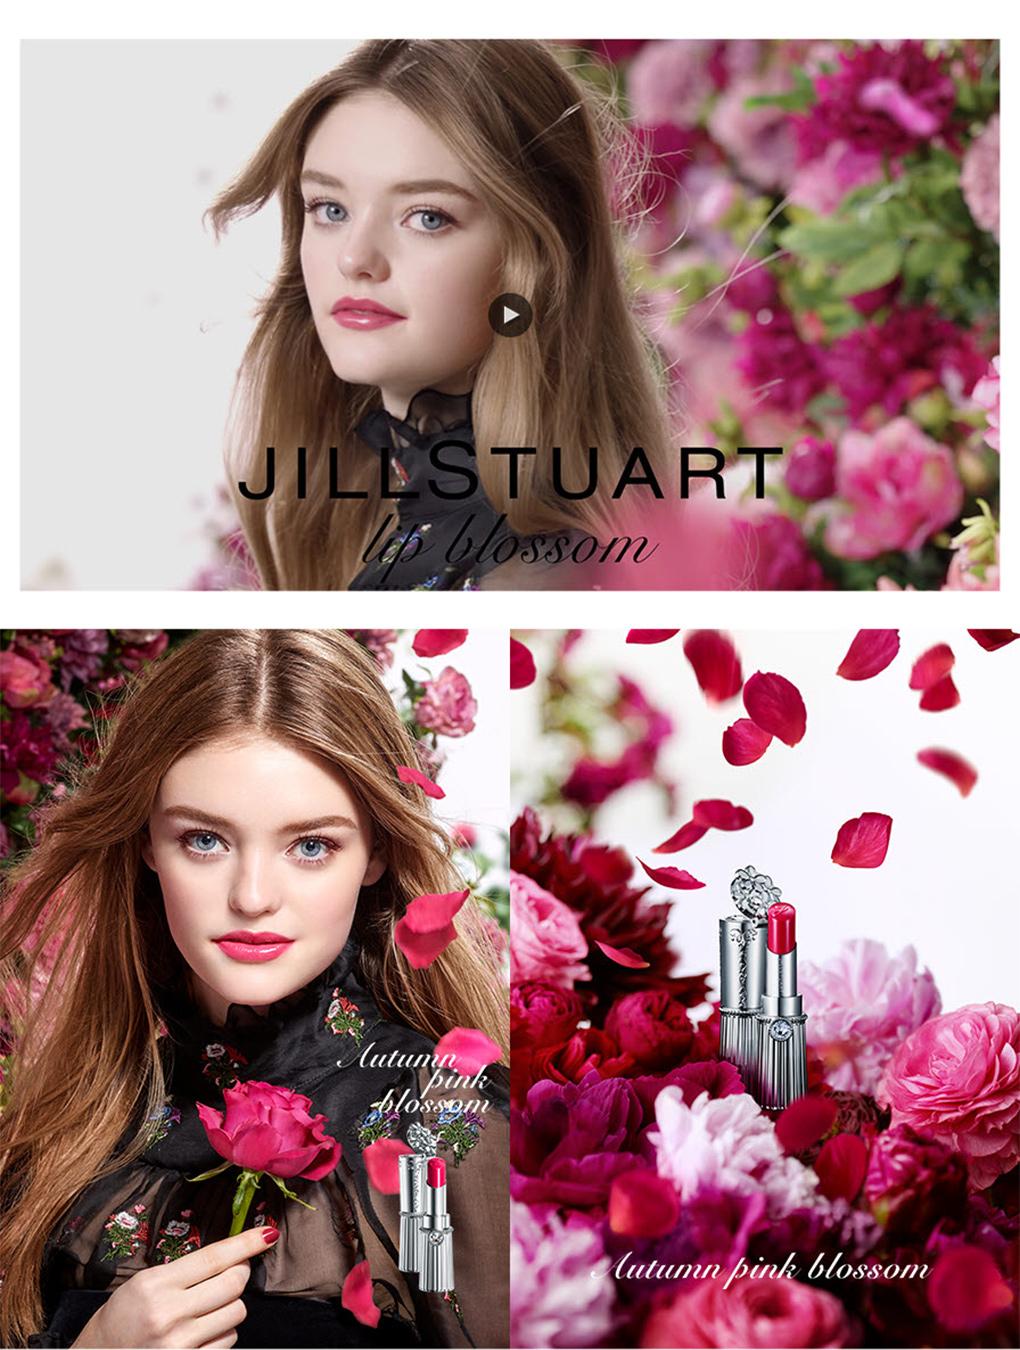 JILL STUART Lip Blossom